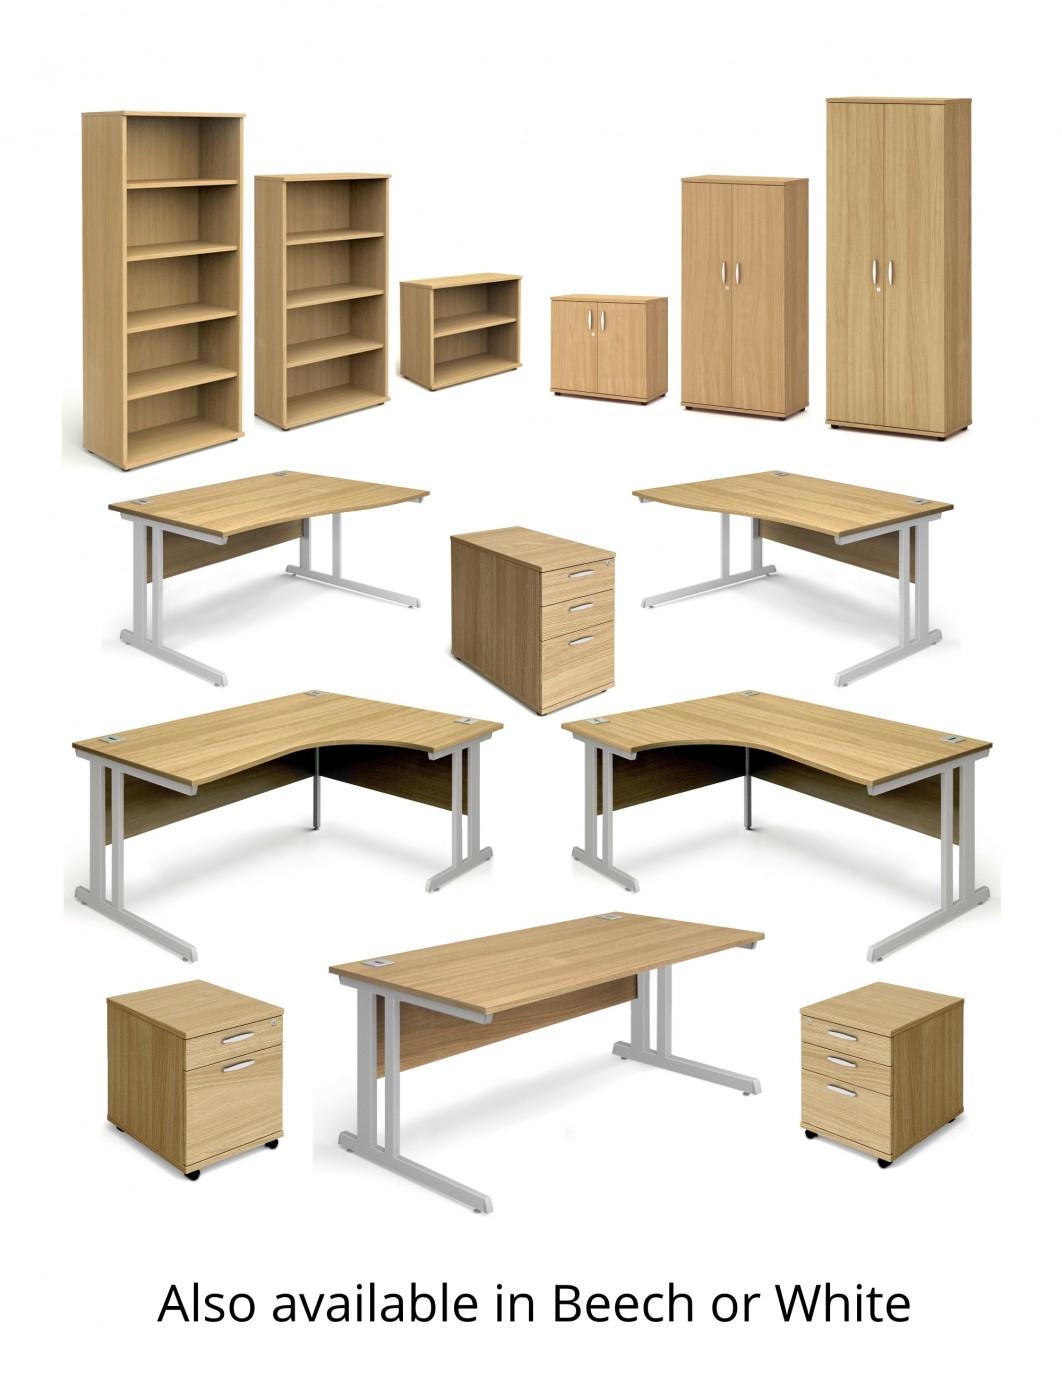 Peachy Oak Office Desk 1400X800Mm Aspire Desk Et Sd 1400 Ok Home Interior And Landscaping Transignezvosmurscom